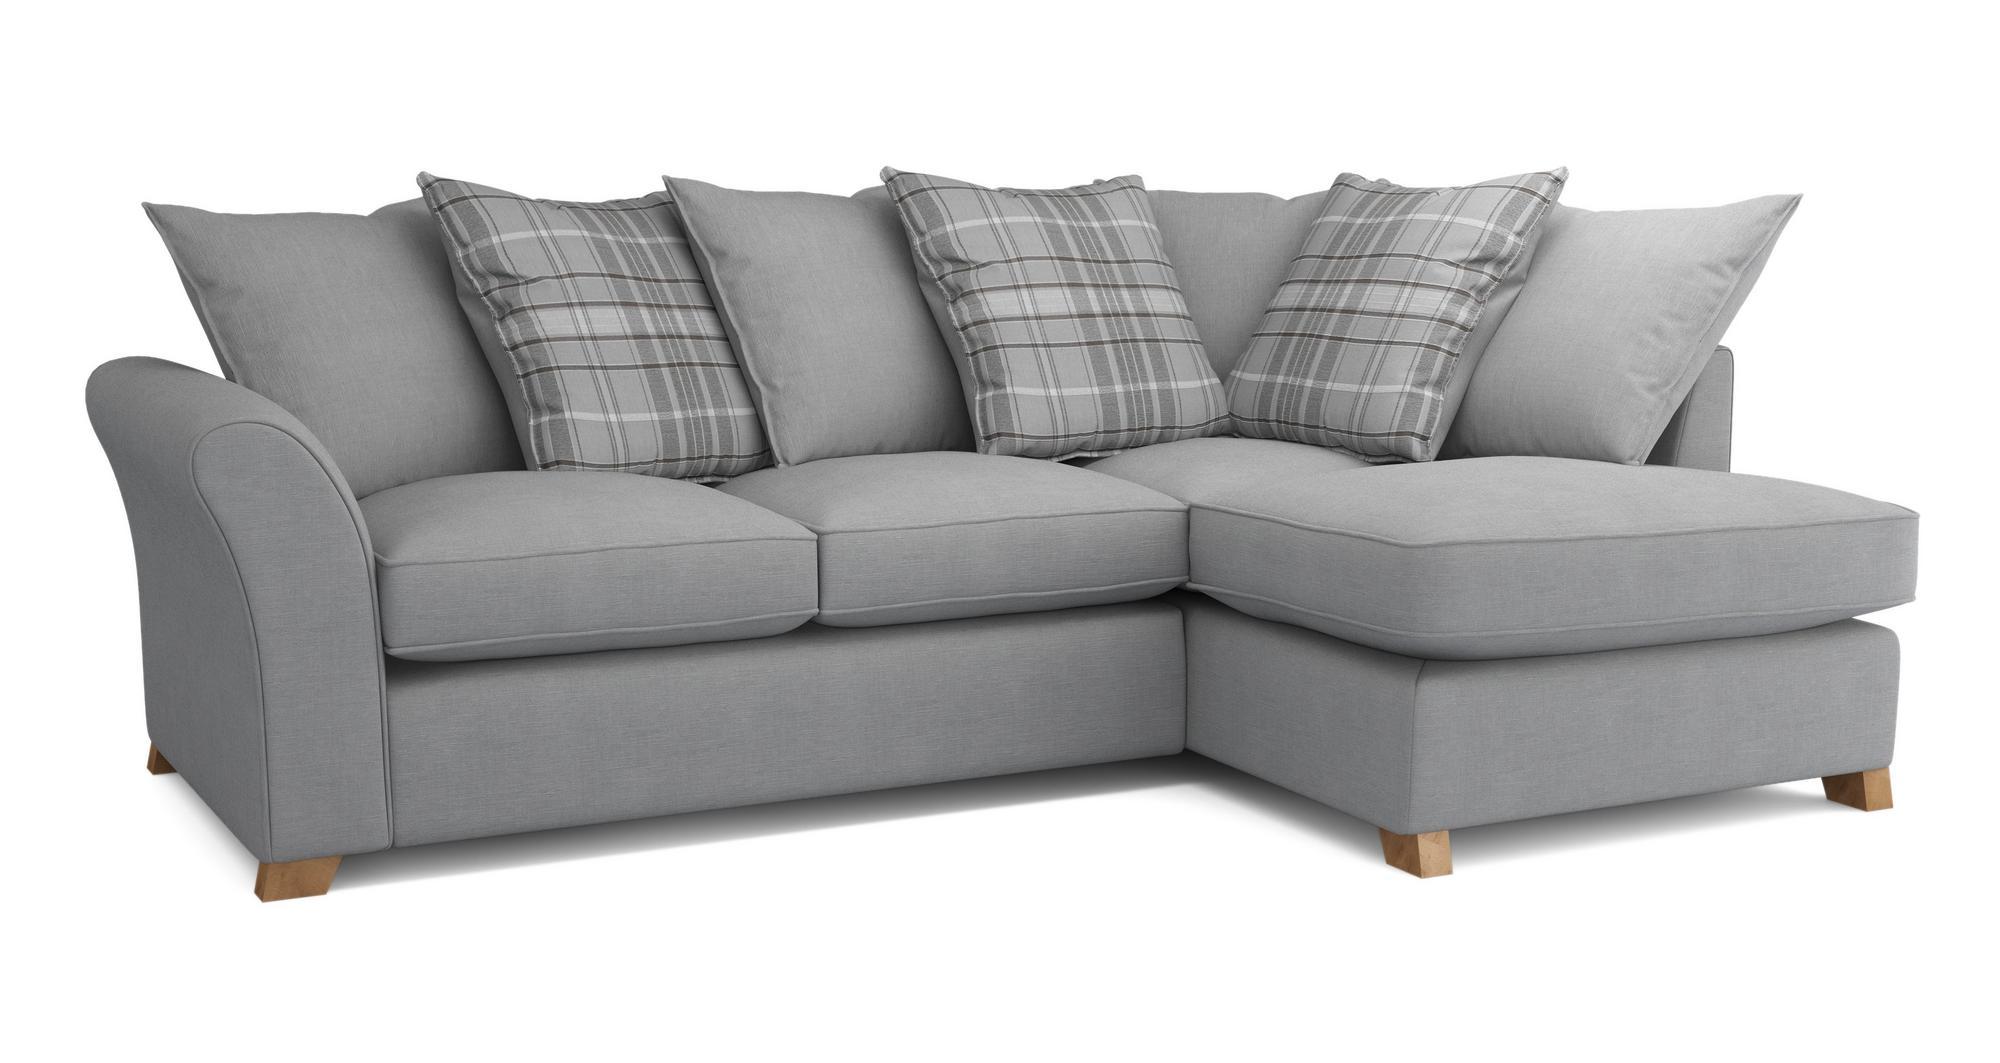 dfs jasper ash grey fabric corner sofa storage stool. Black Bedroom Furniture Sets. Home Design Ideas